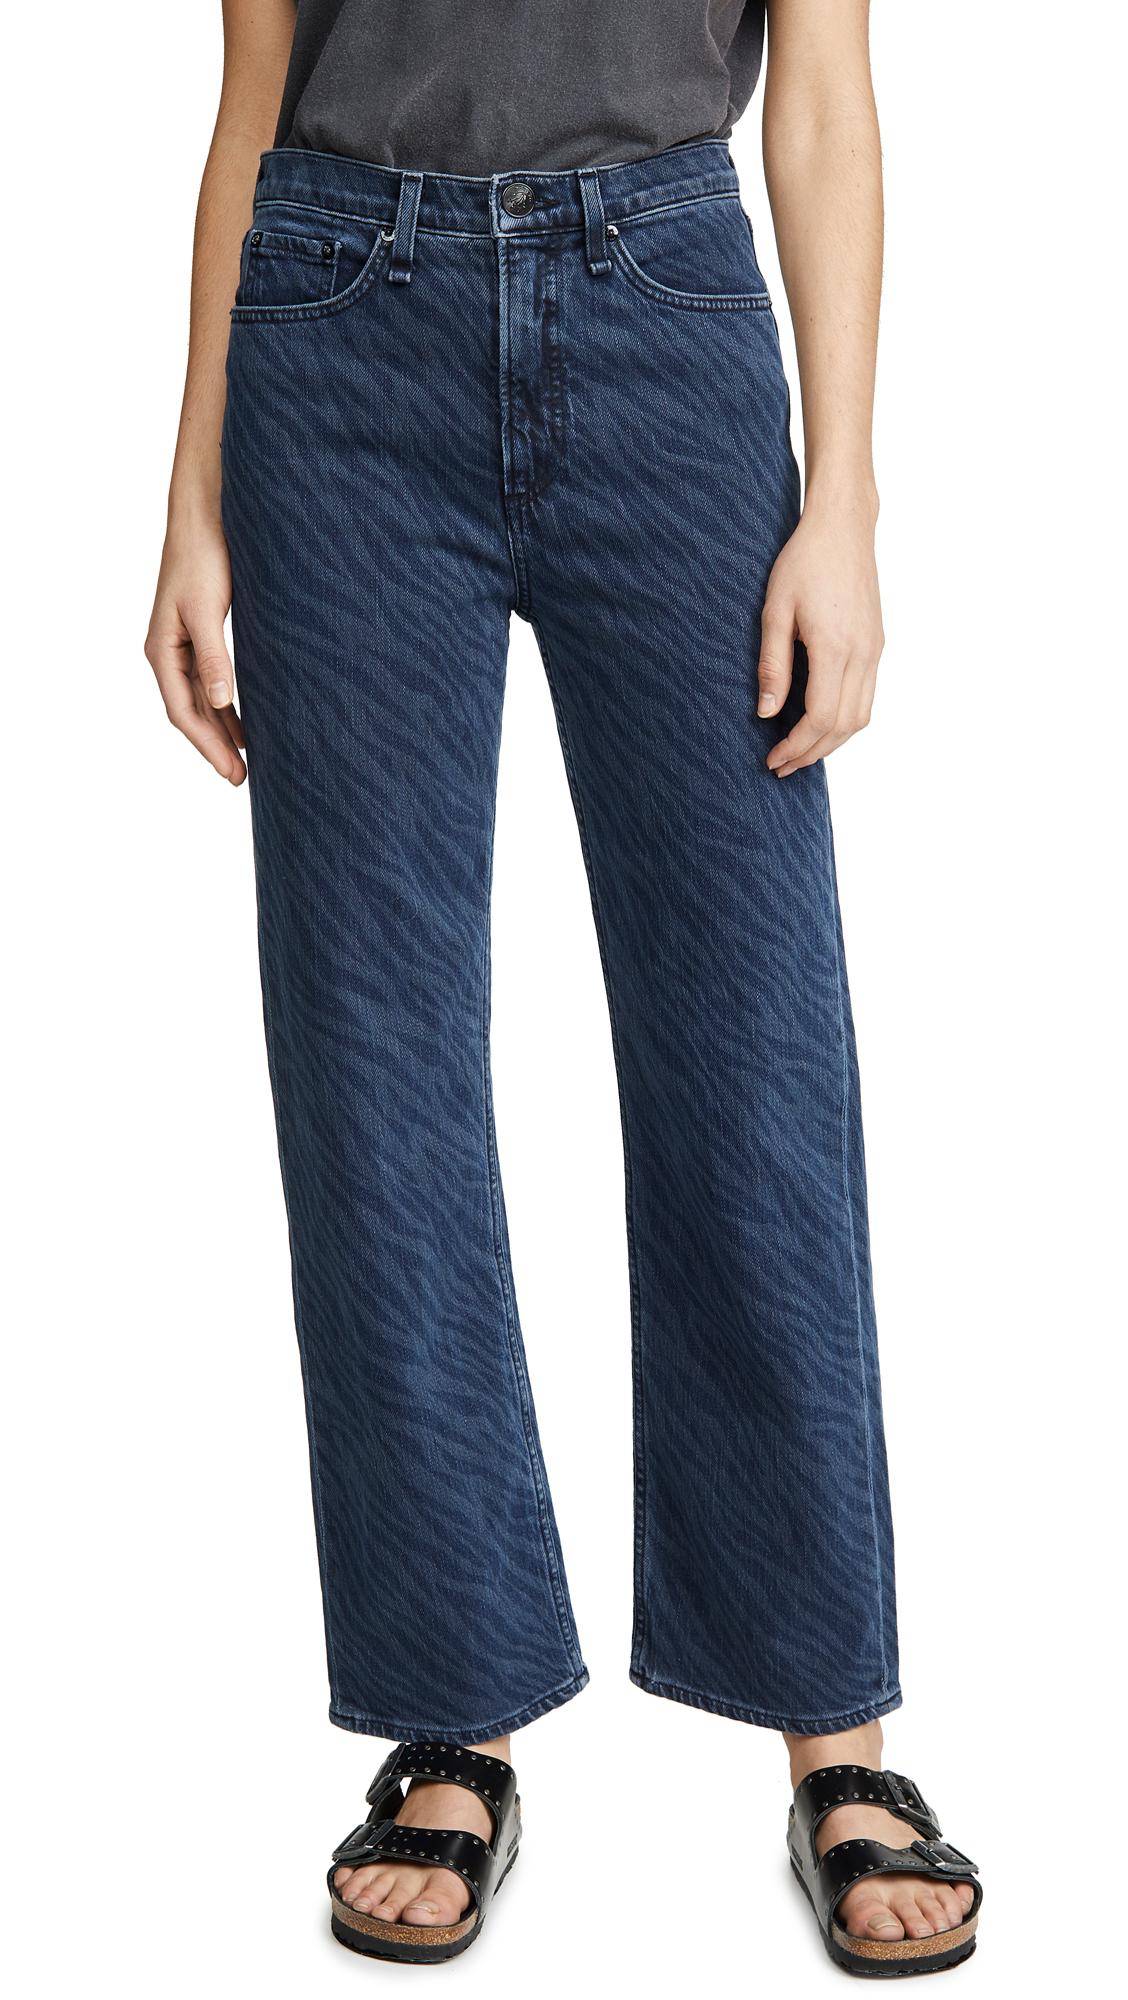 Buy Rag & Bone/JEAN online - photo of Rag & Bone/JEAN Ruth Super High-Rise Straight Jeans